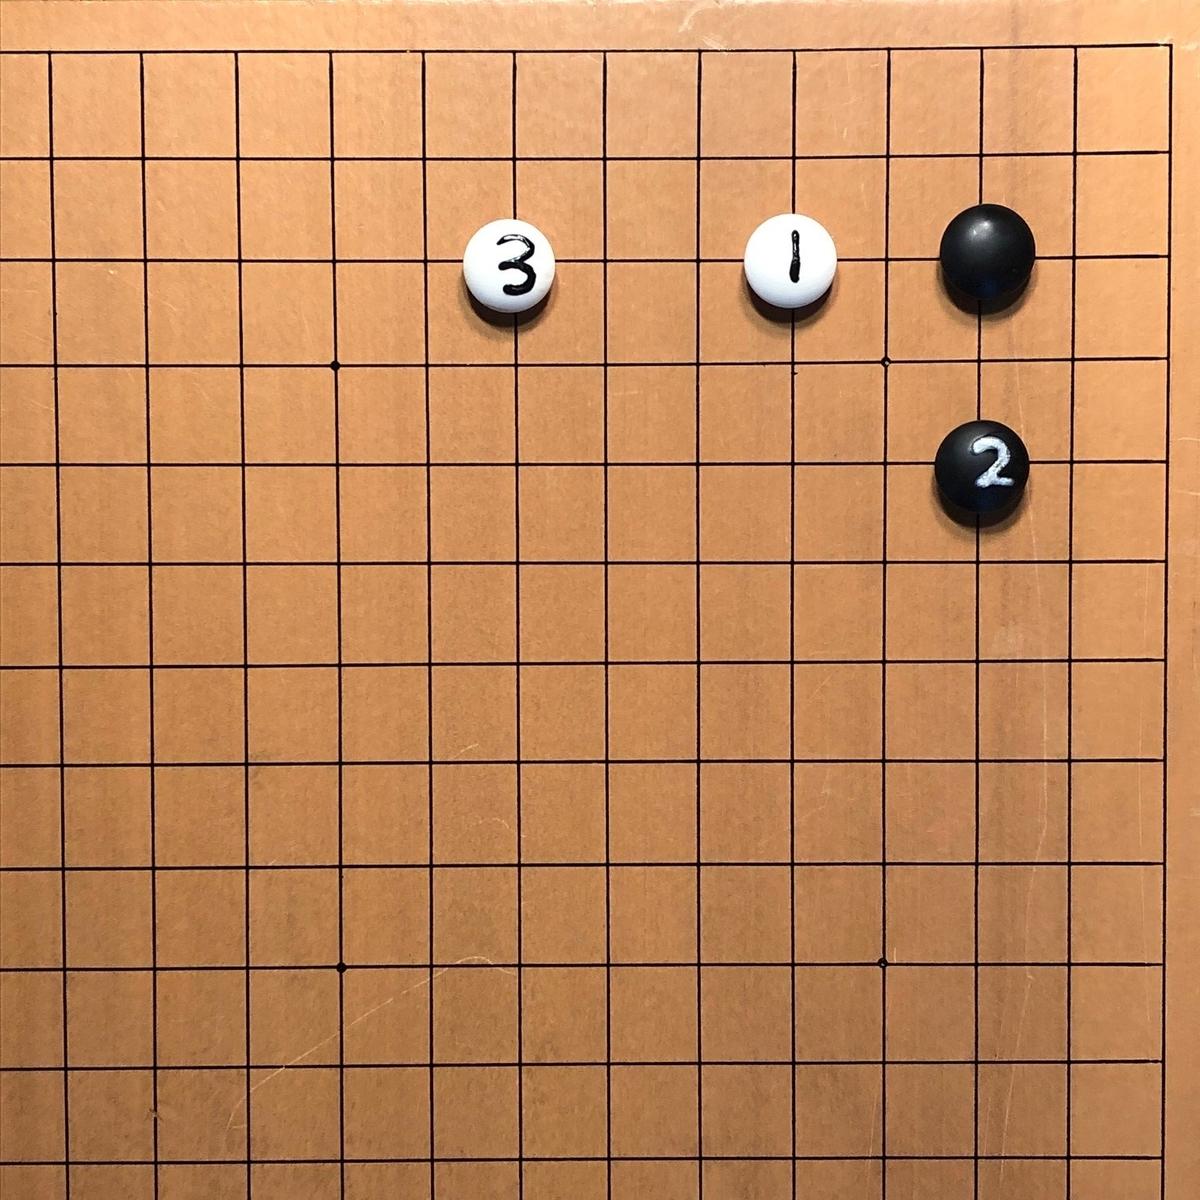 f:id:ryu-igo:20200325104907j:plain